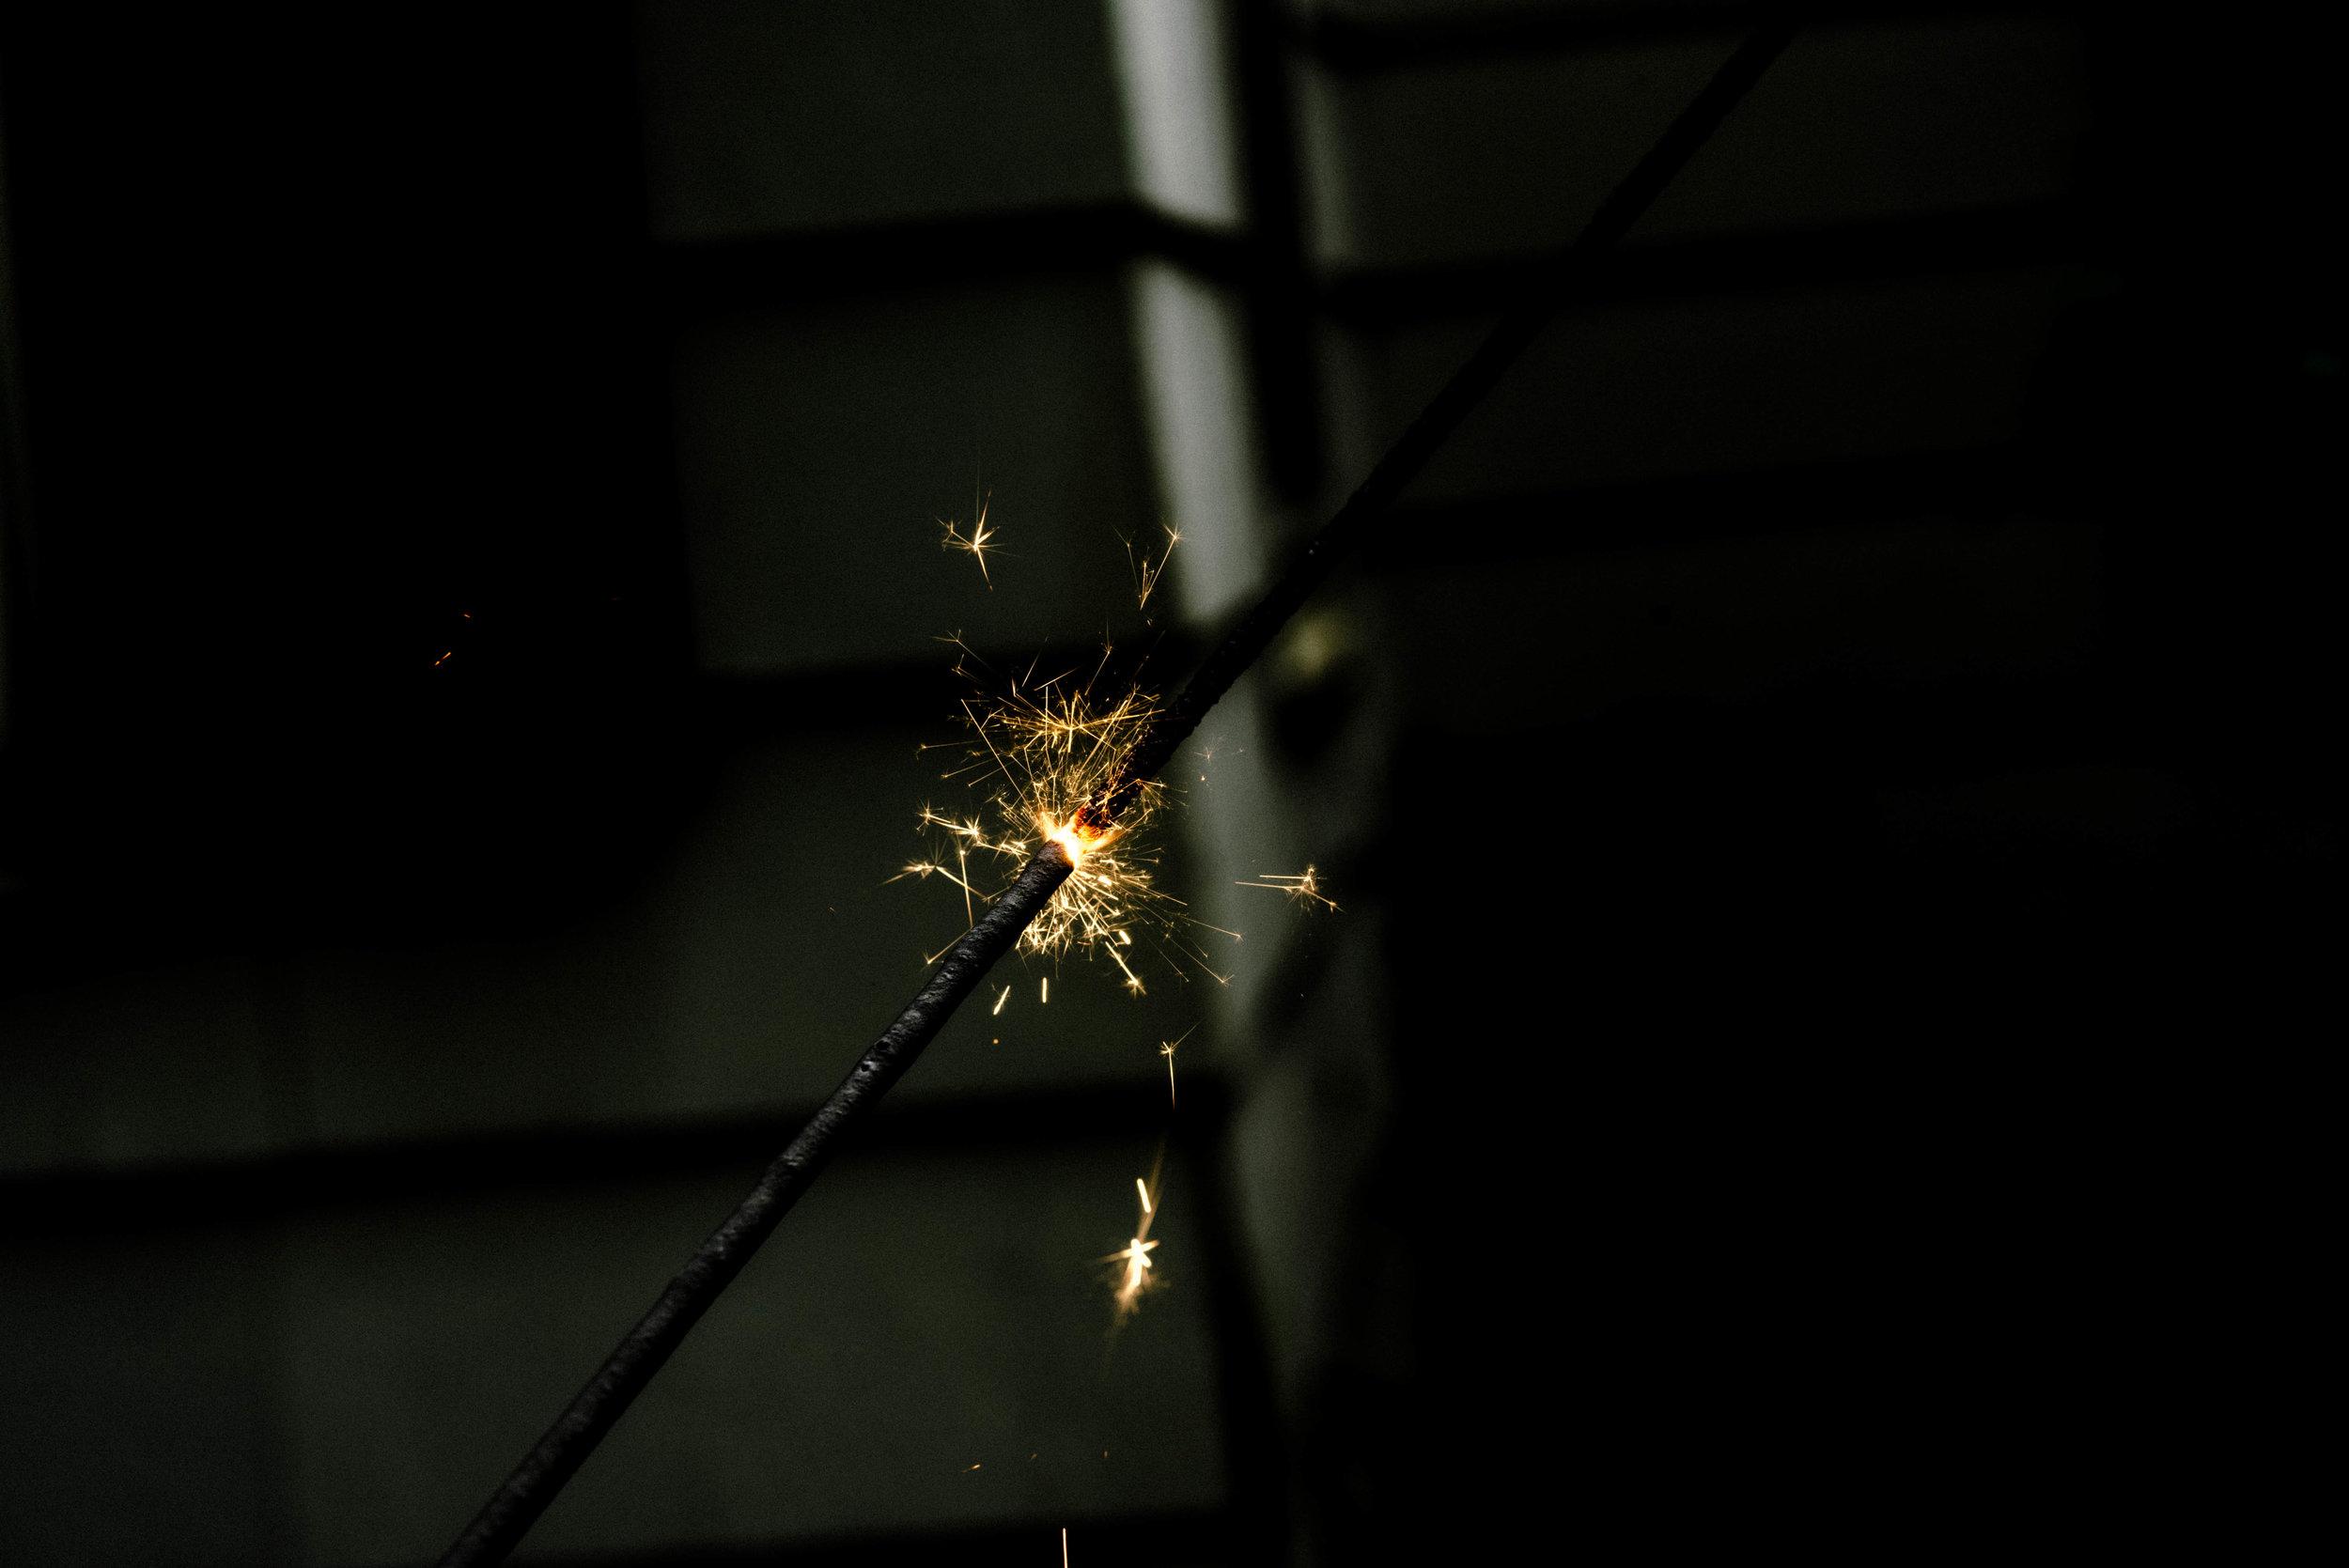 Fireworks-1-7.jpg